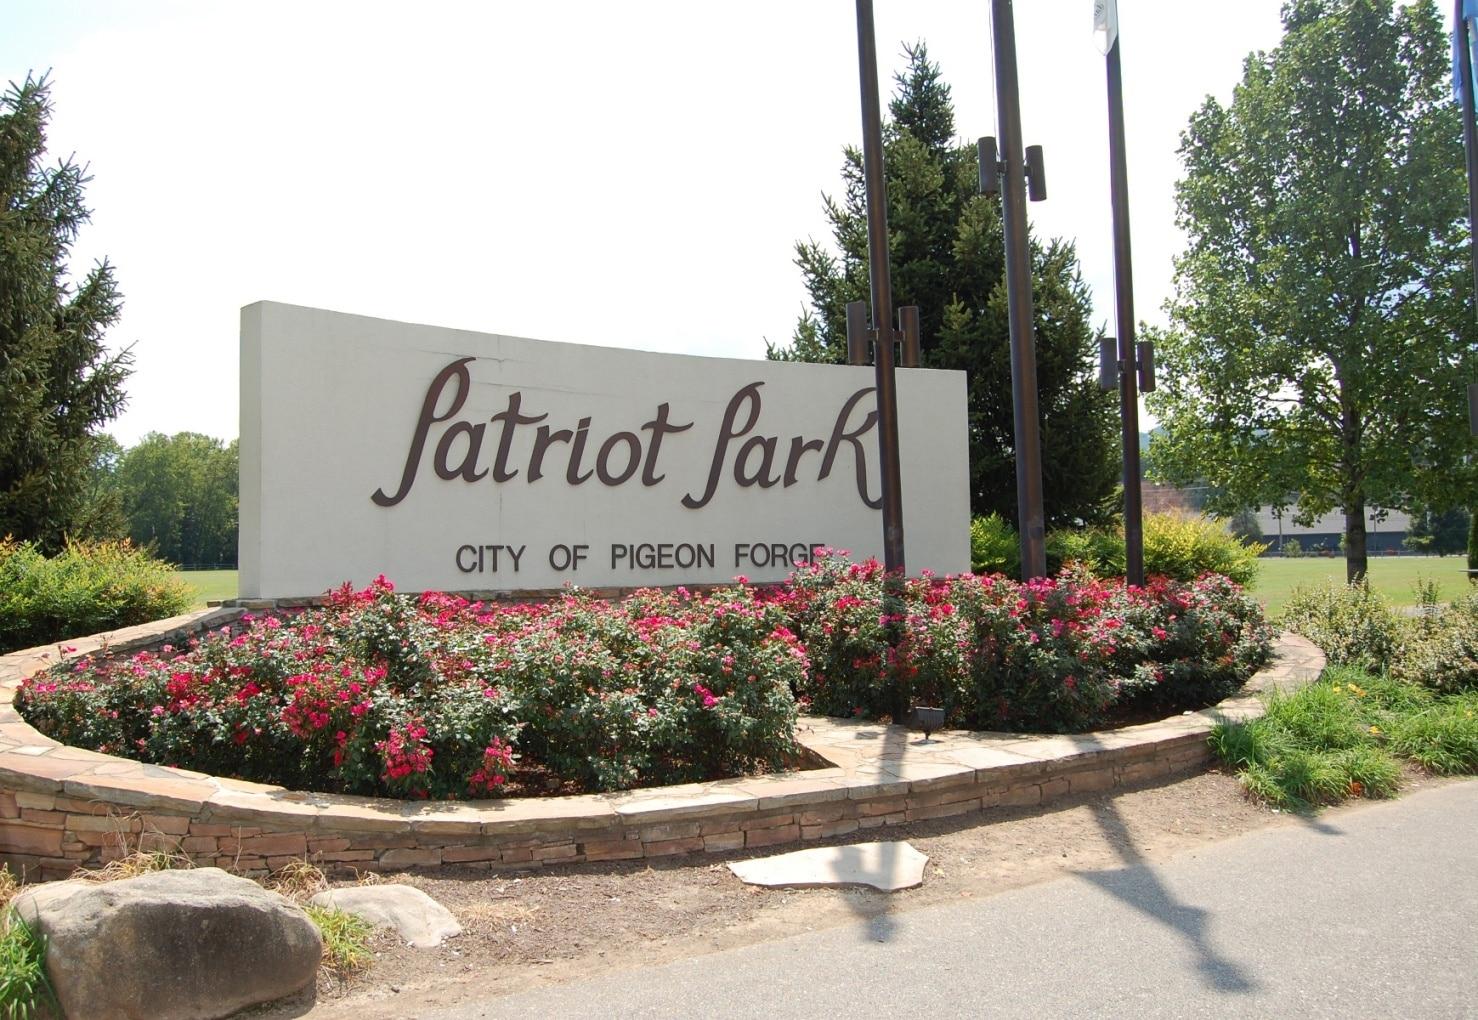 Patriot Park 4-2-2015